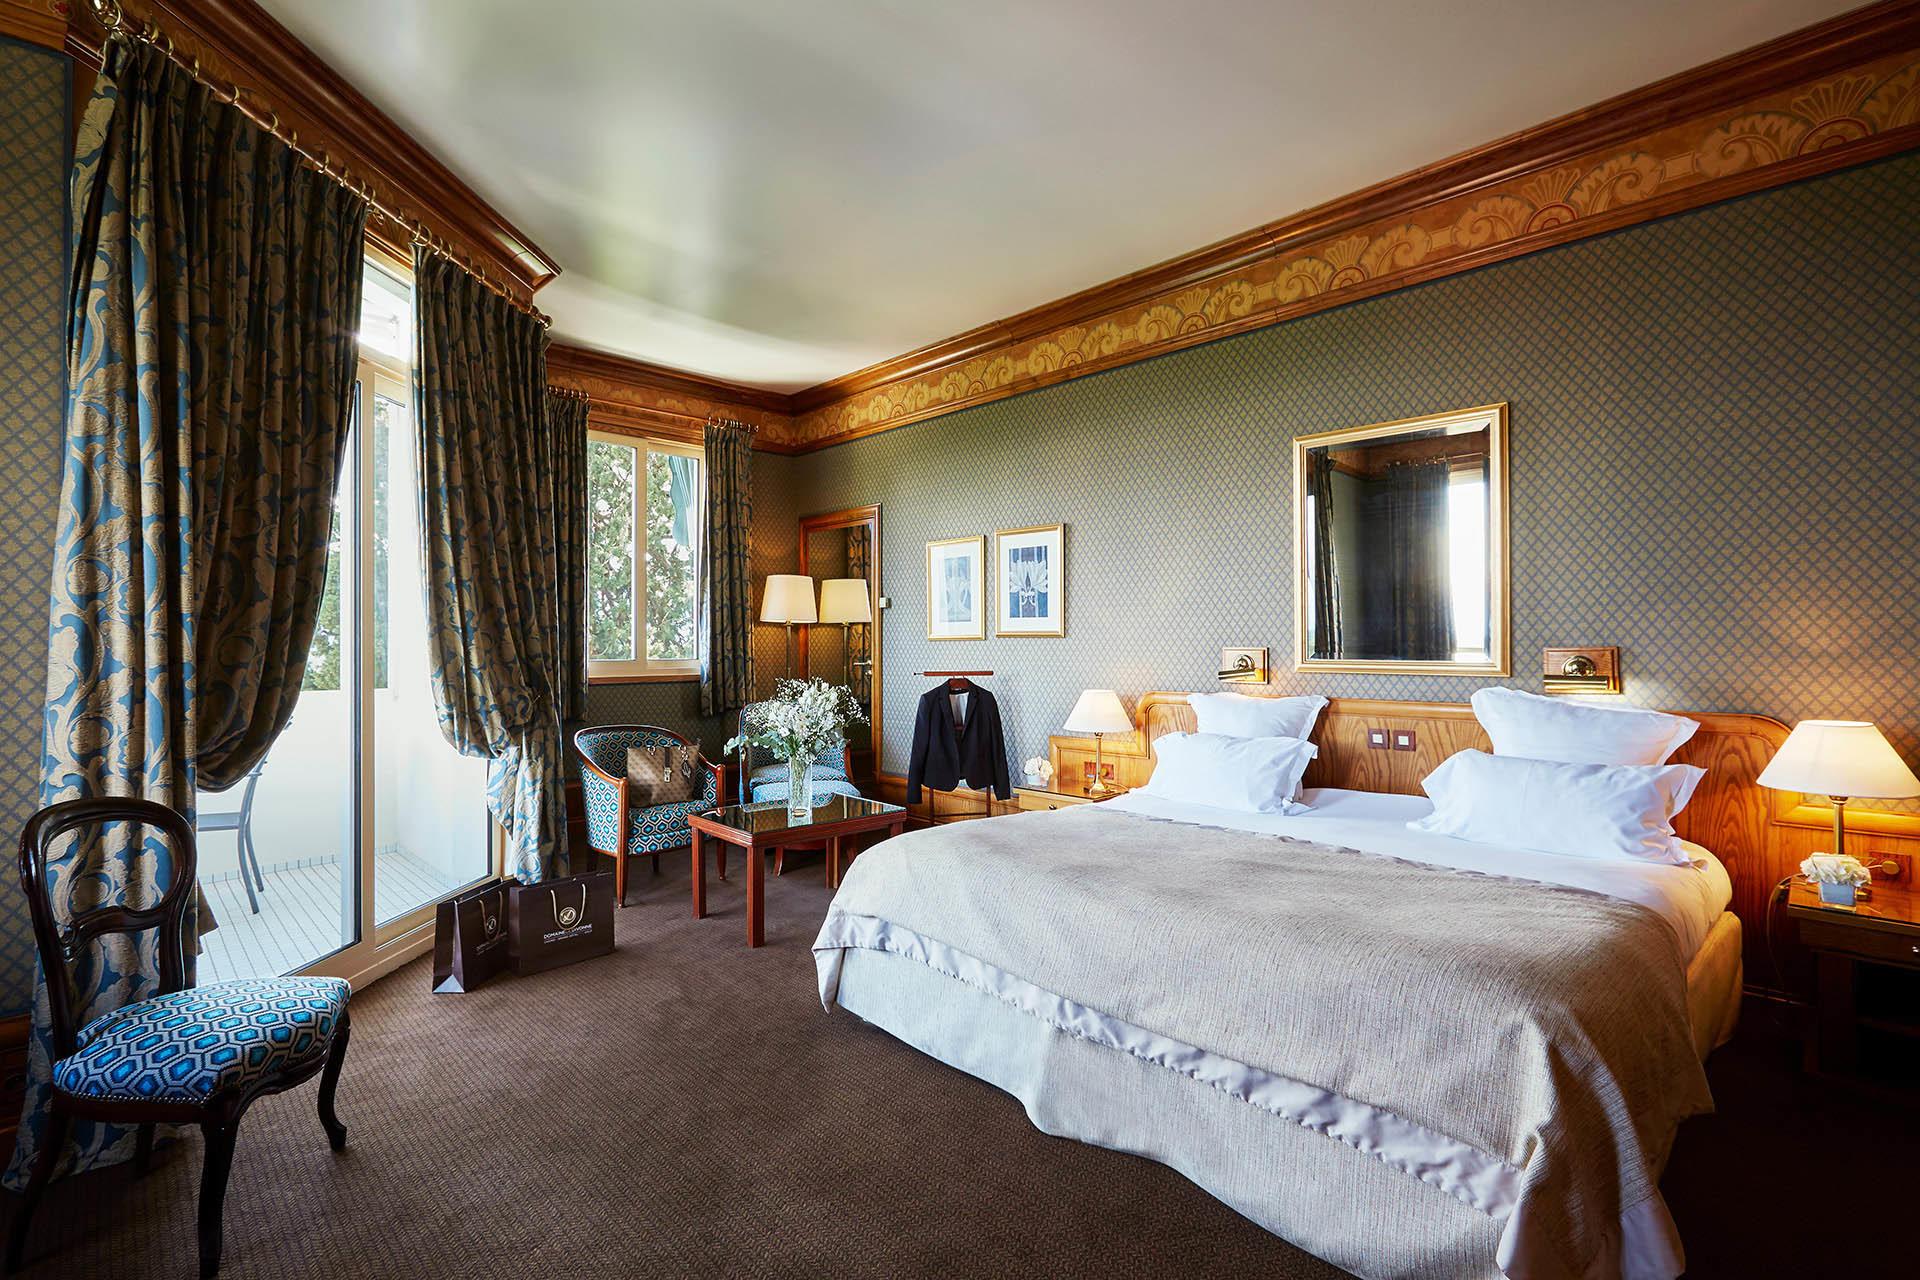 Deluxe Room at Domaine de Divonne Hotel in Divonne-les-Bains